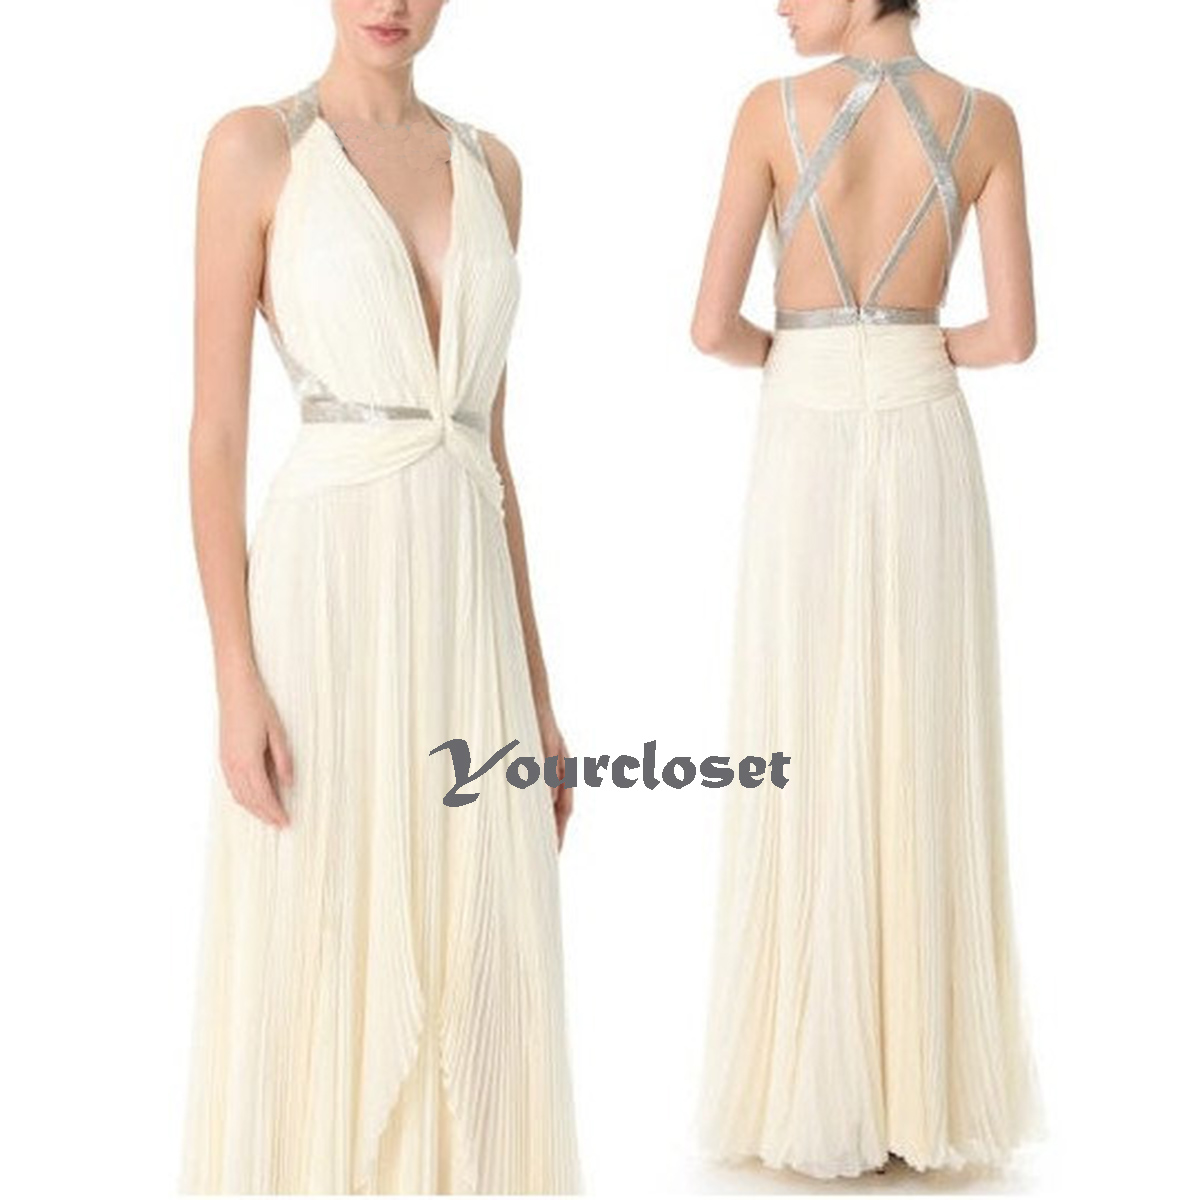 Woodfield Prom Dresses Plus Size Prom Dresses